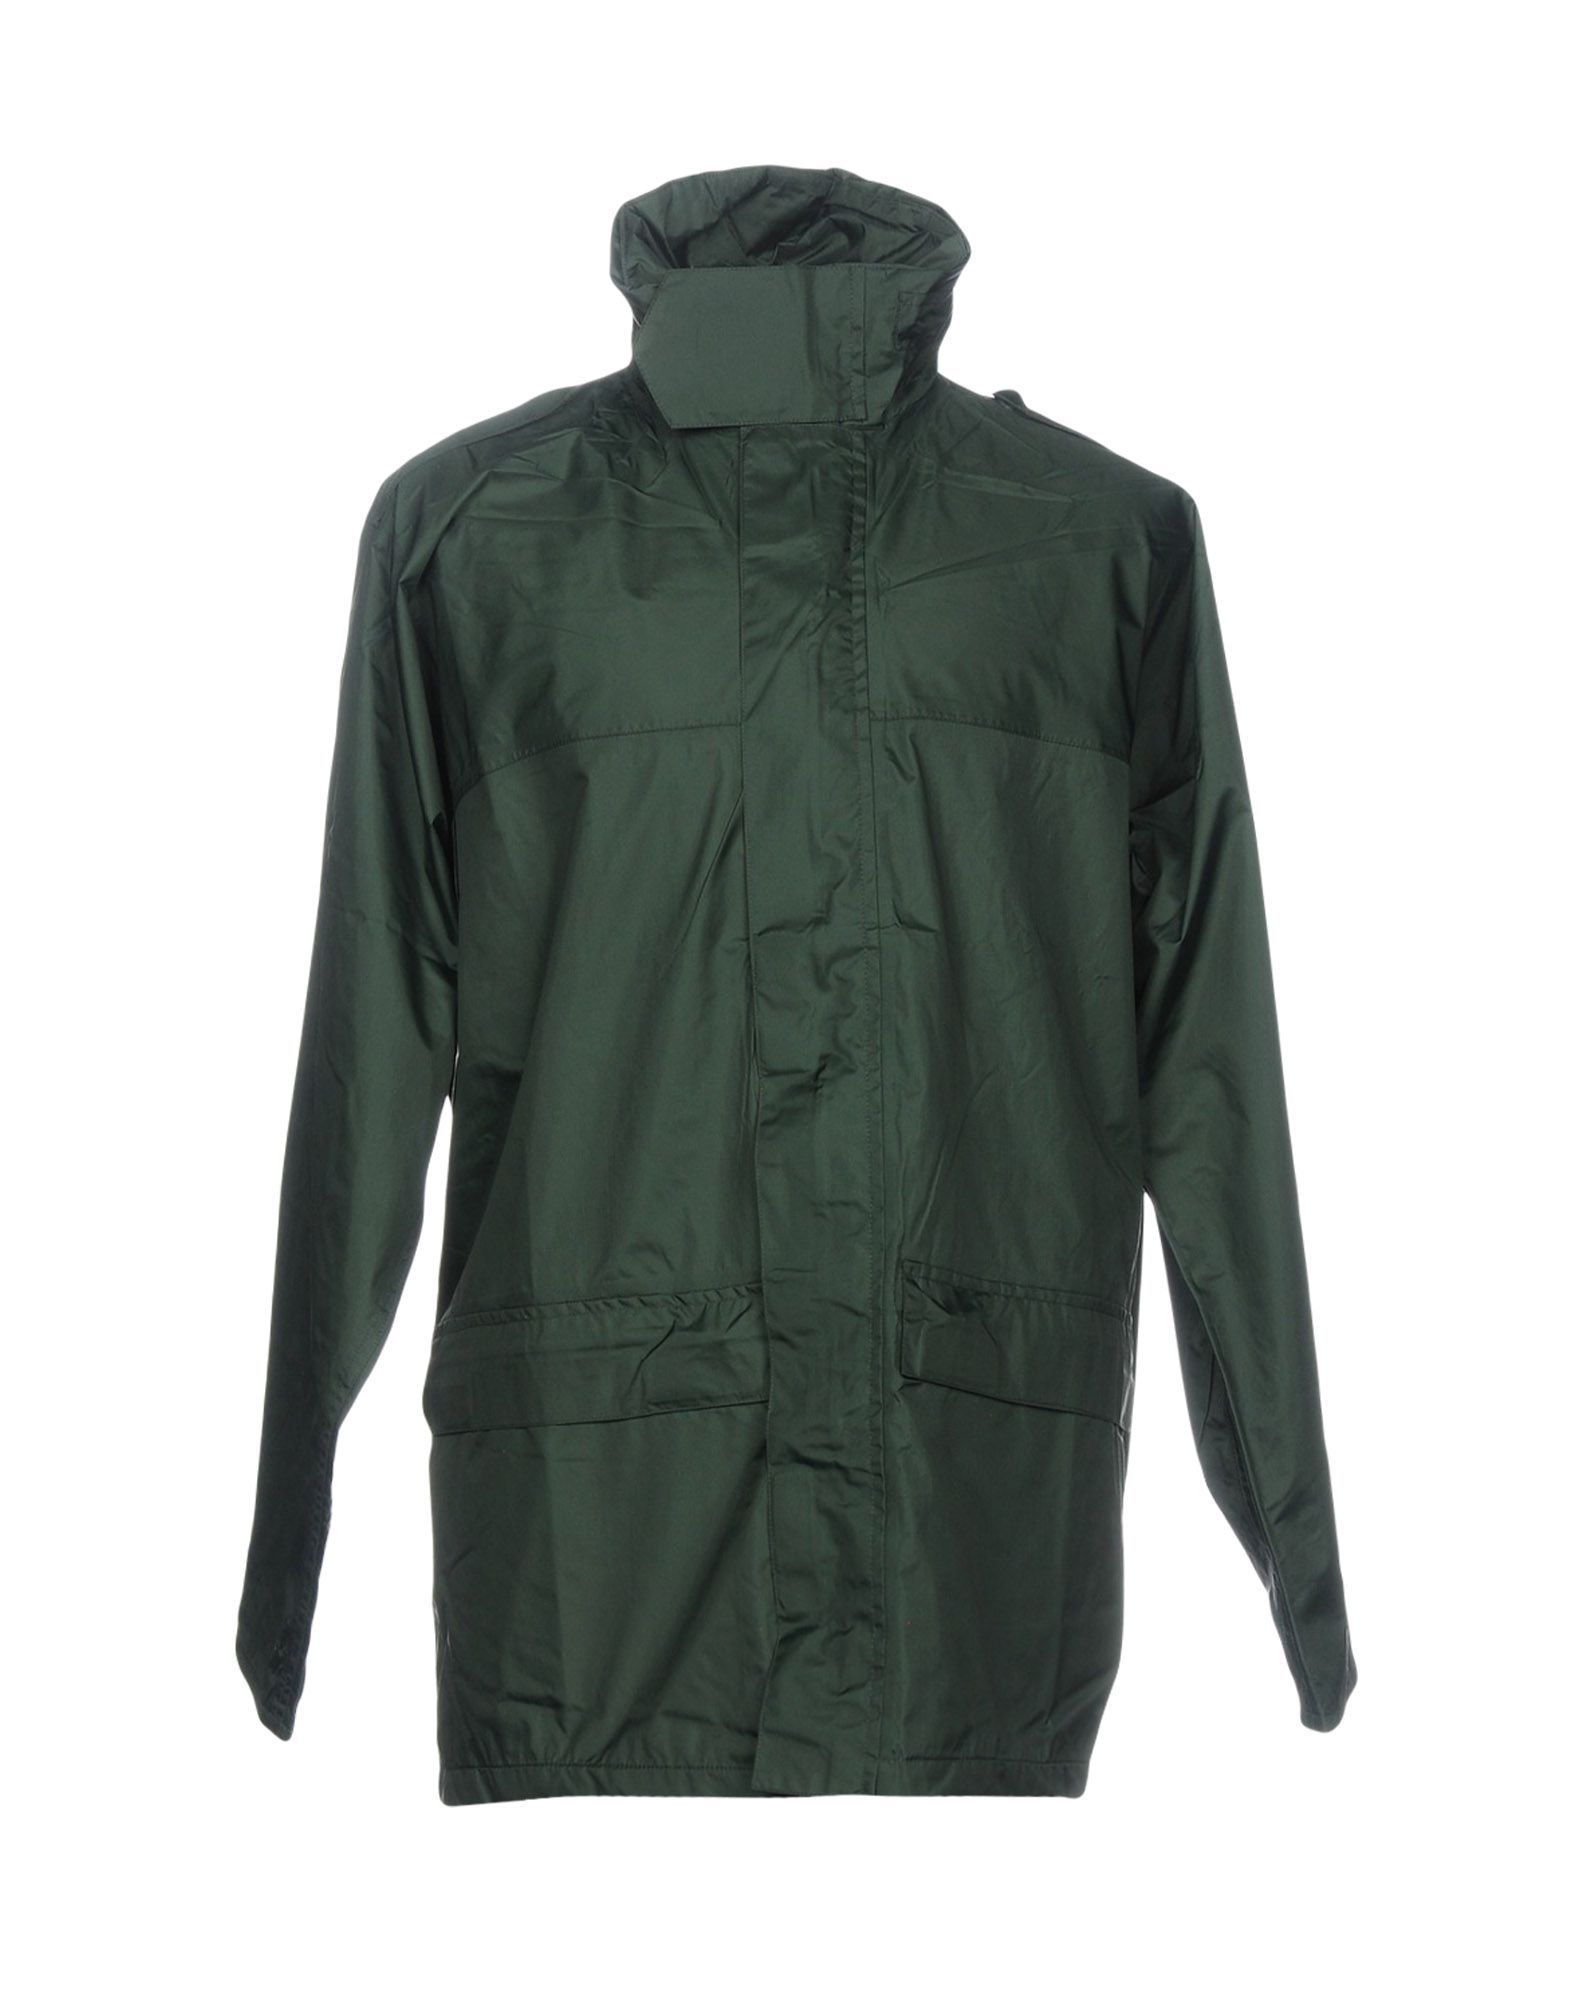 Aspesi Dark Green Techno Fabric Jacket